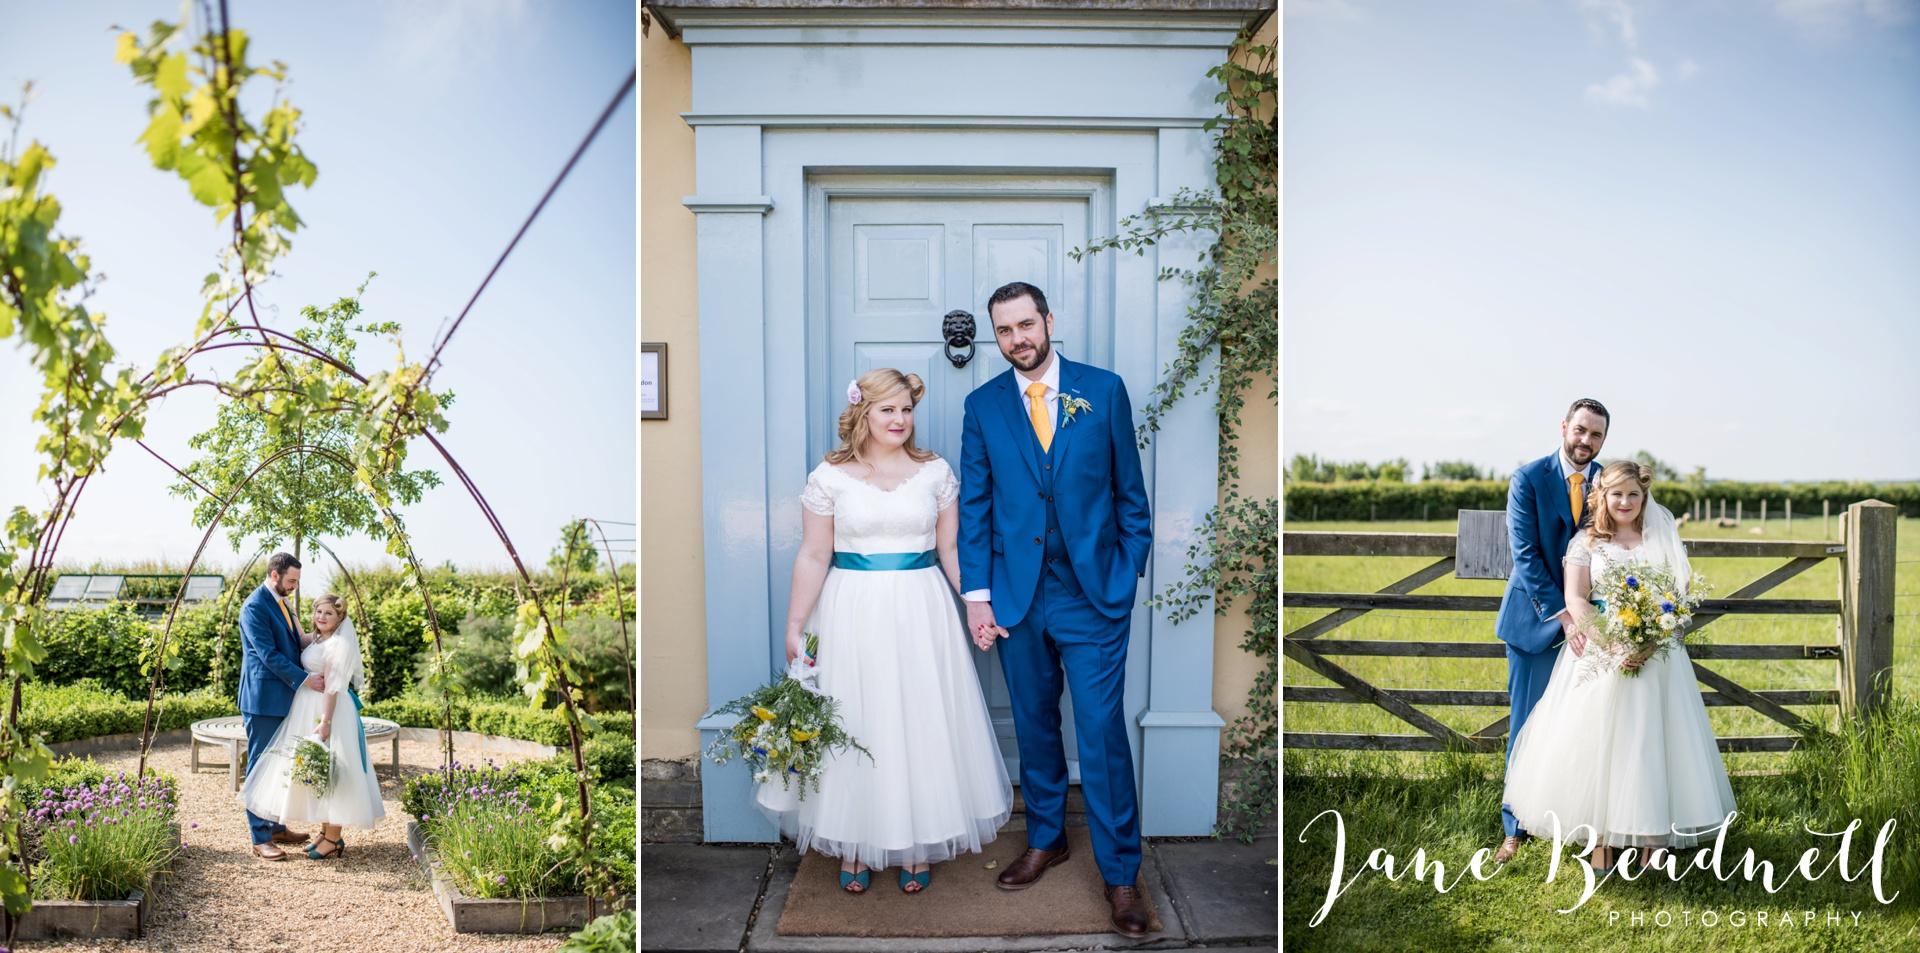 South Farm Wedding photography Hertfordshire by Jane Beadnell Photography fine art wedding photographer_0141